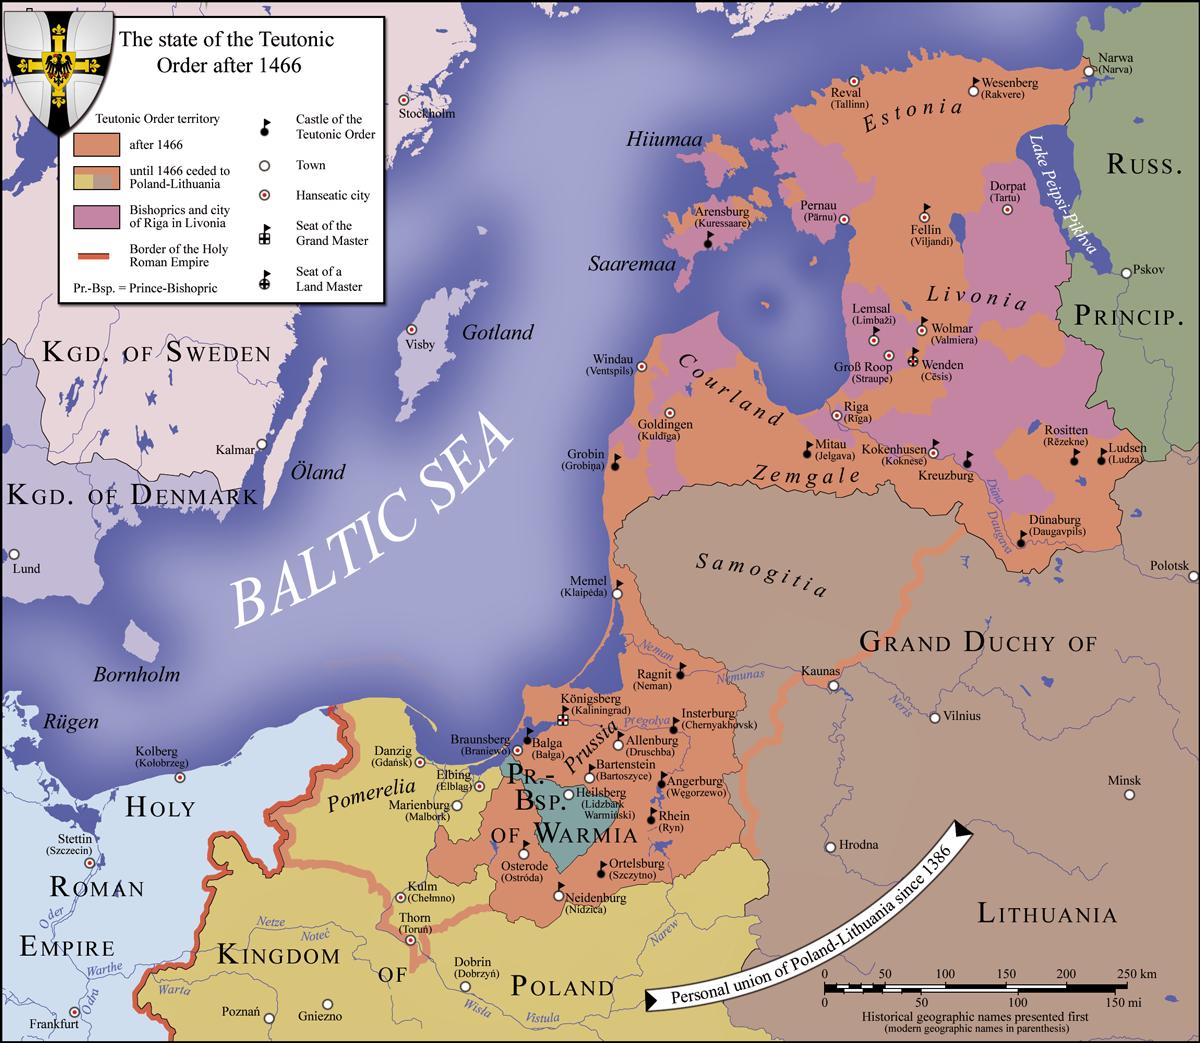 Teutonic_Order_1466.png?uselang=ru